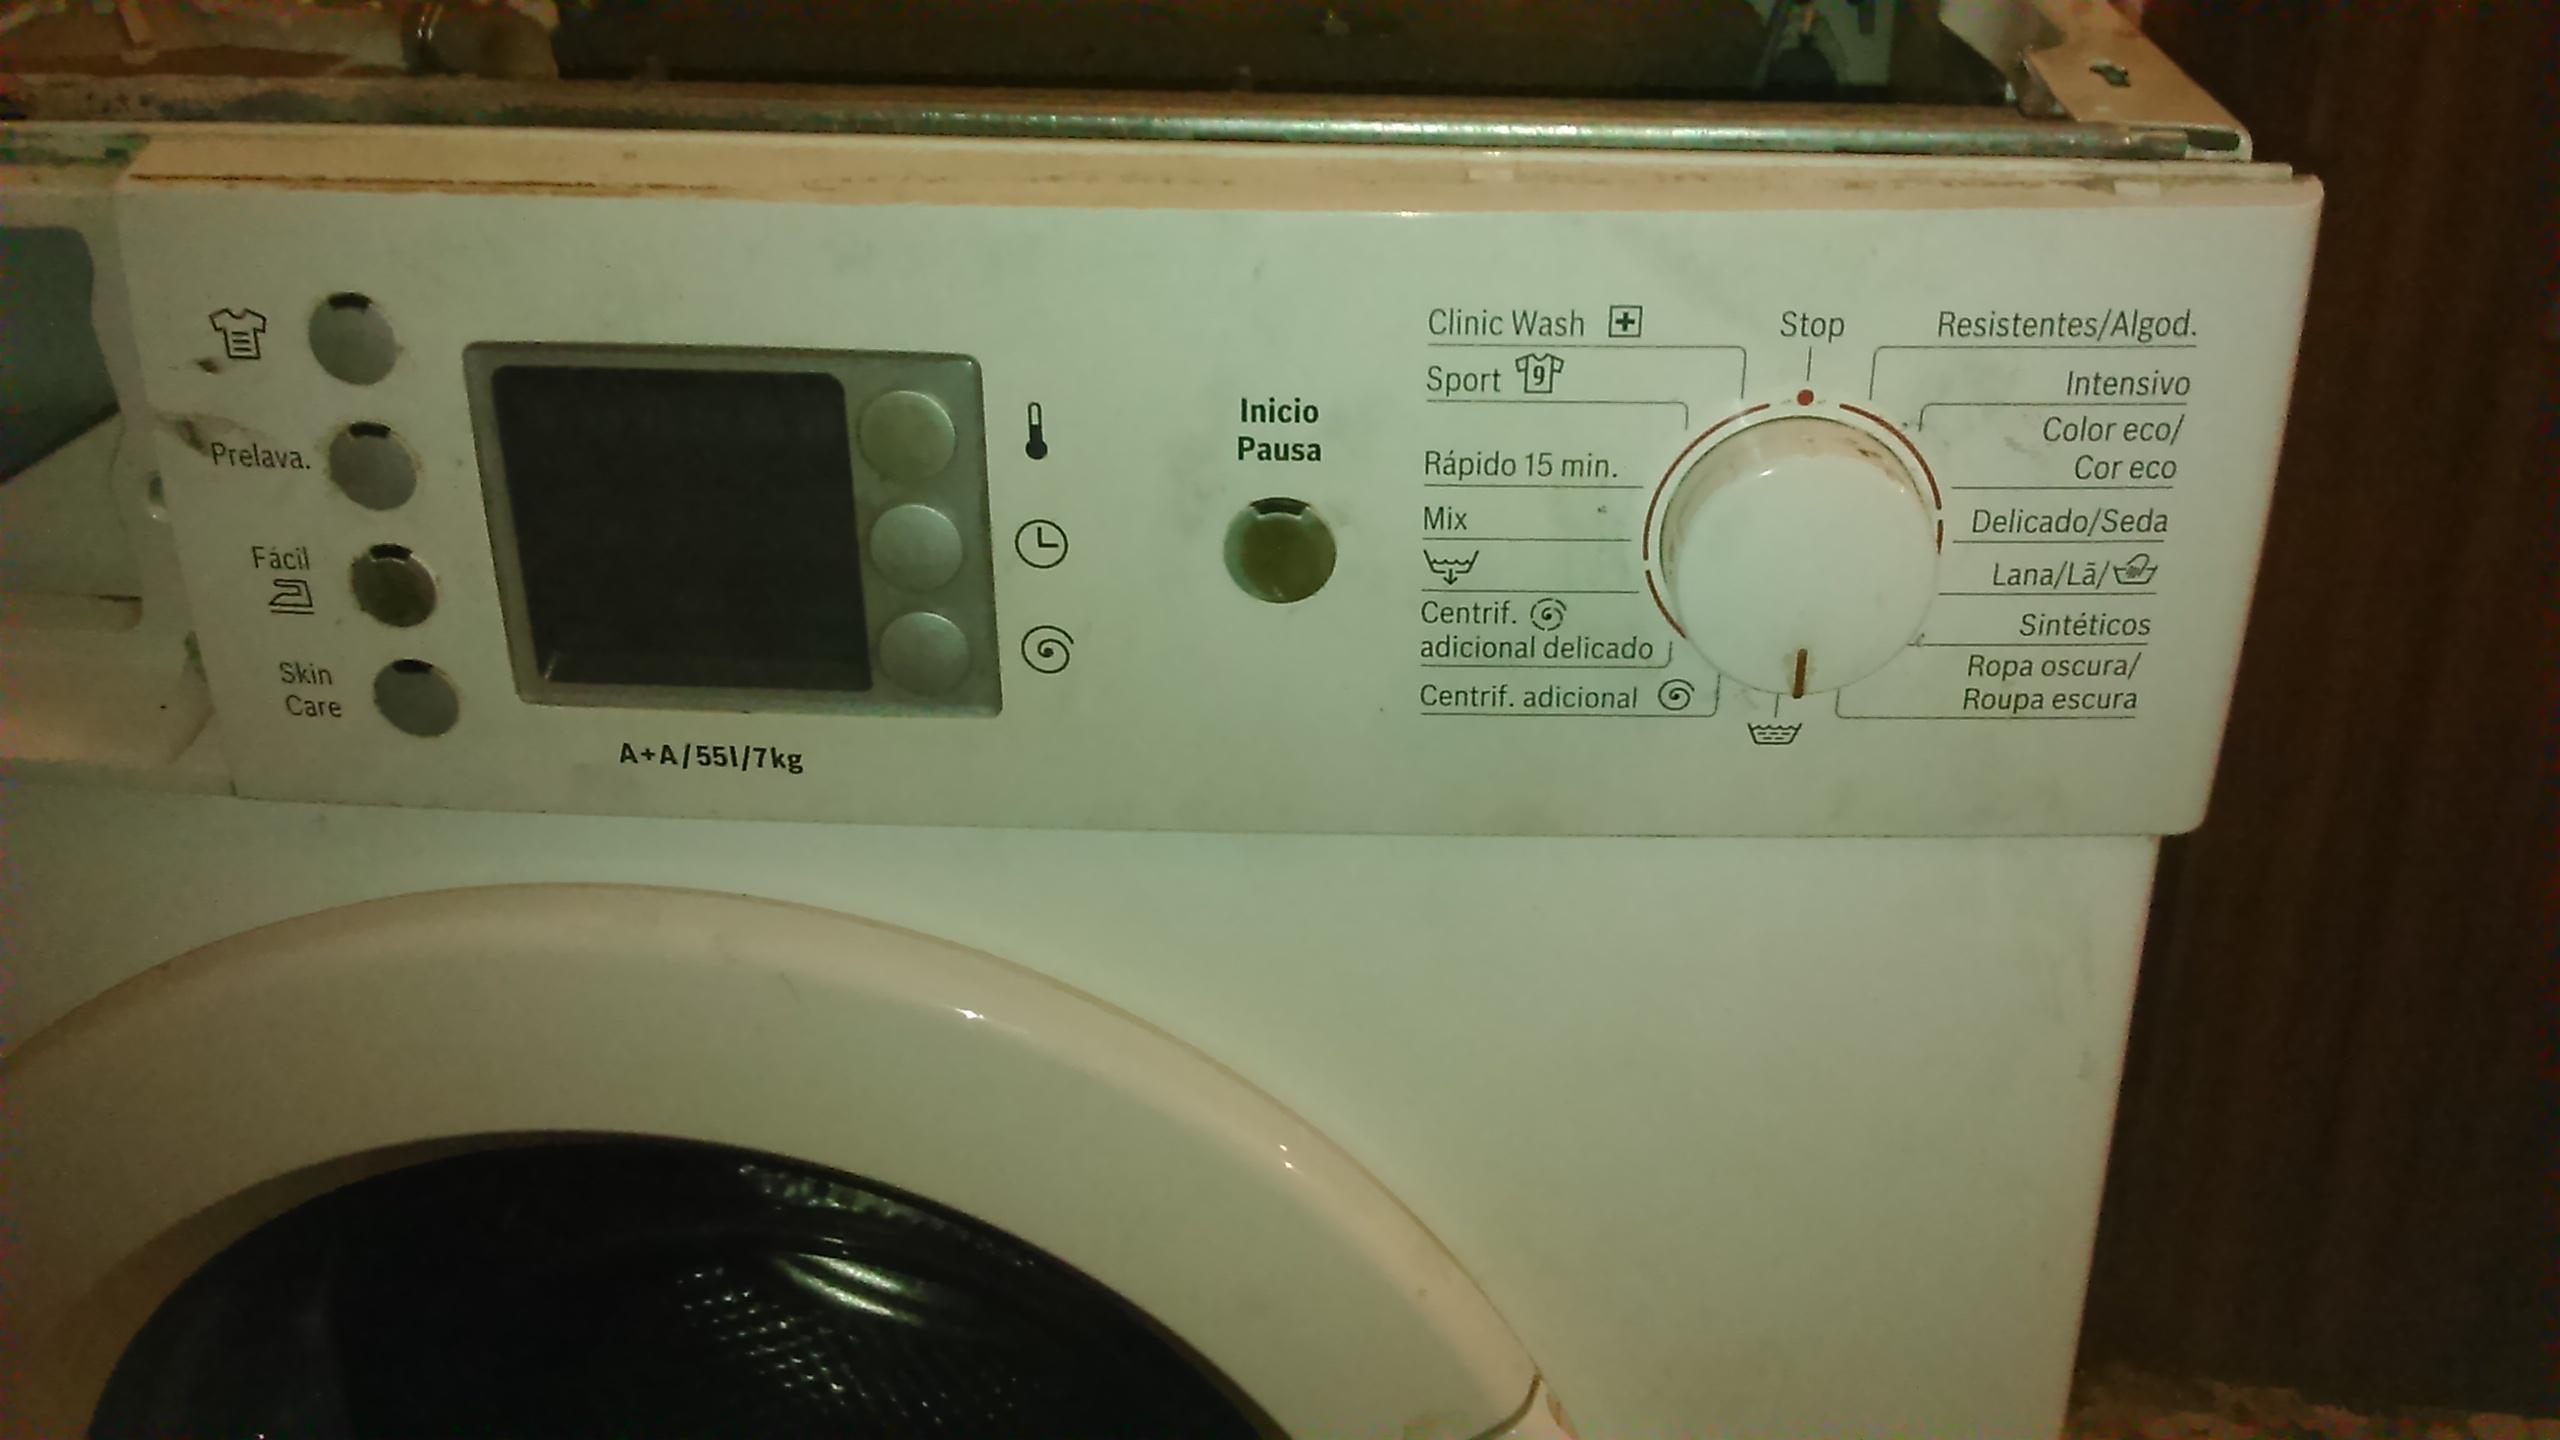 solucionado lavadora bosch fd 8707 bloqueada tras error f21 yoreparo. Black Bedroom Furniture Sets. Home Design Ideas